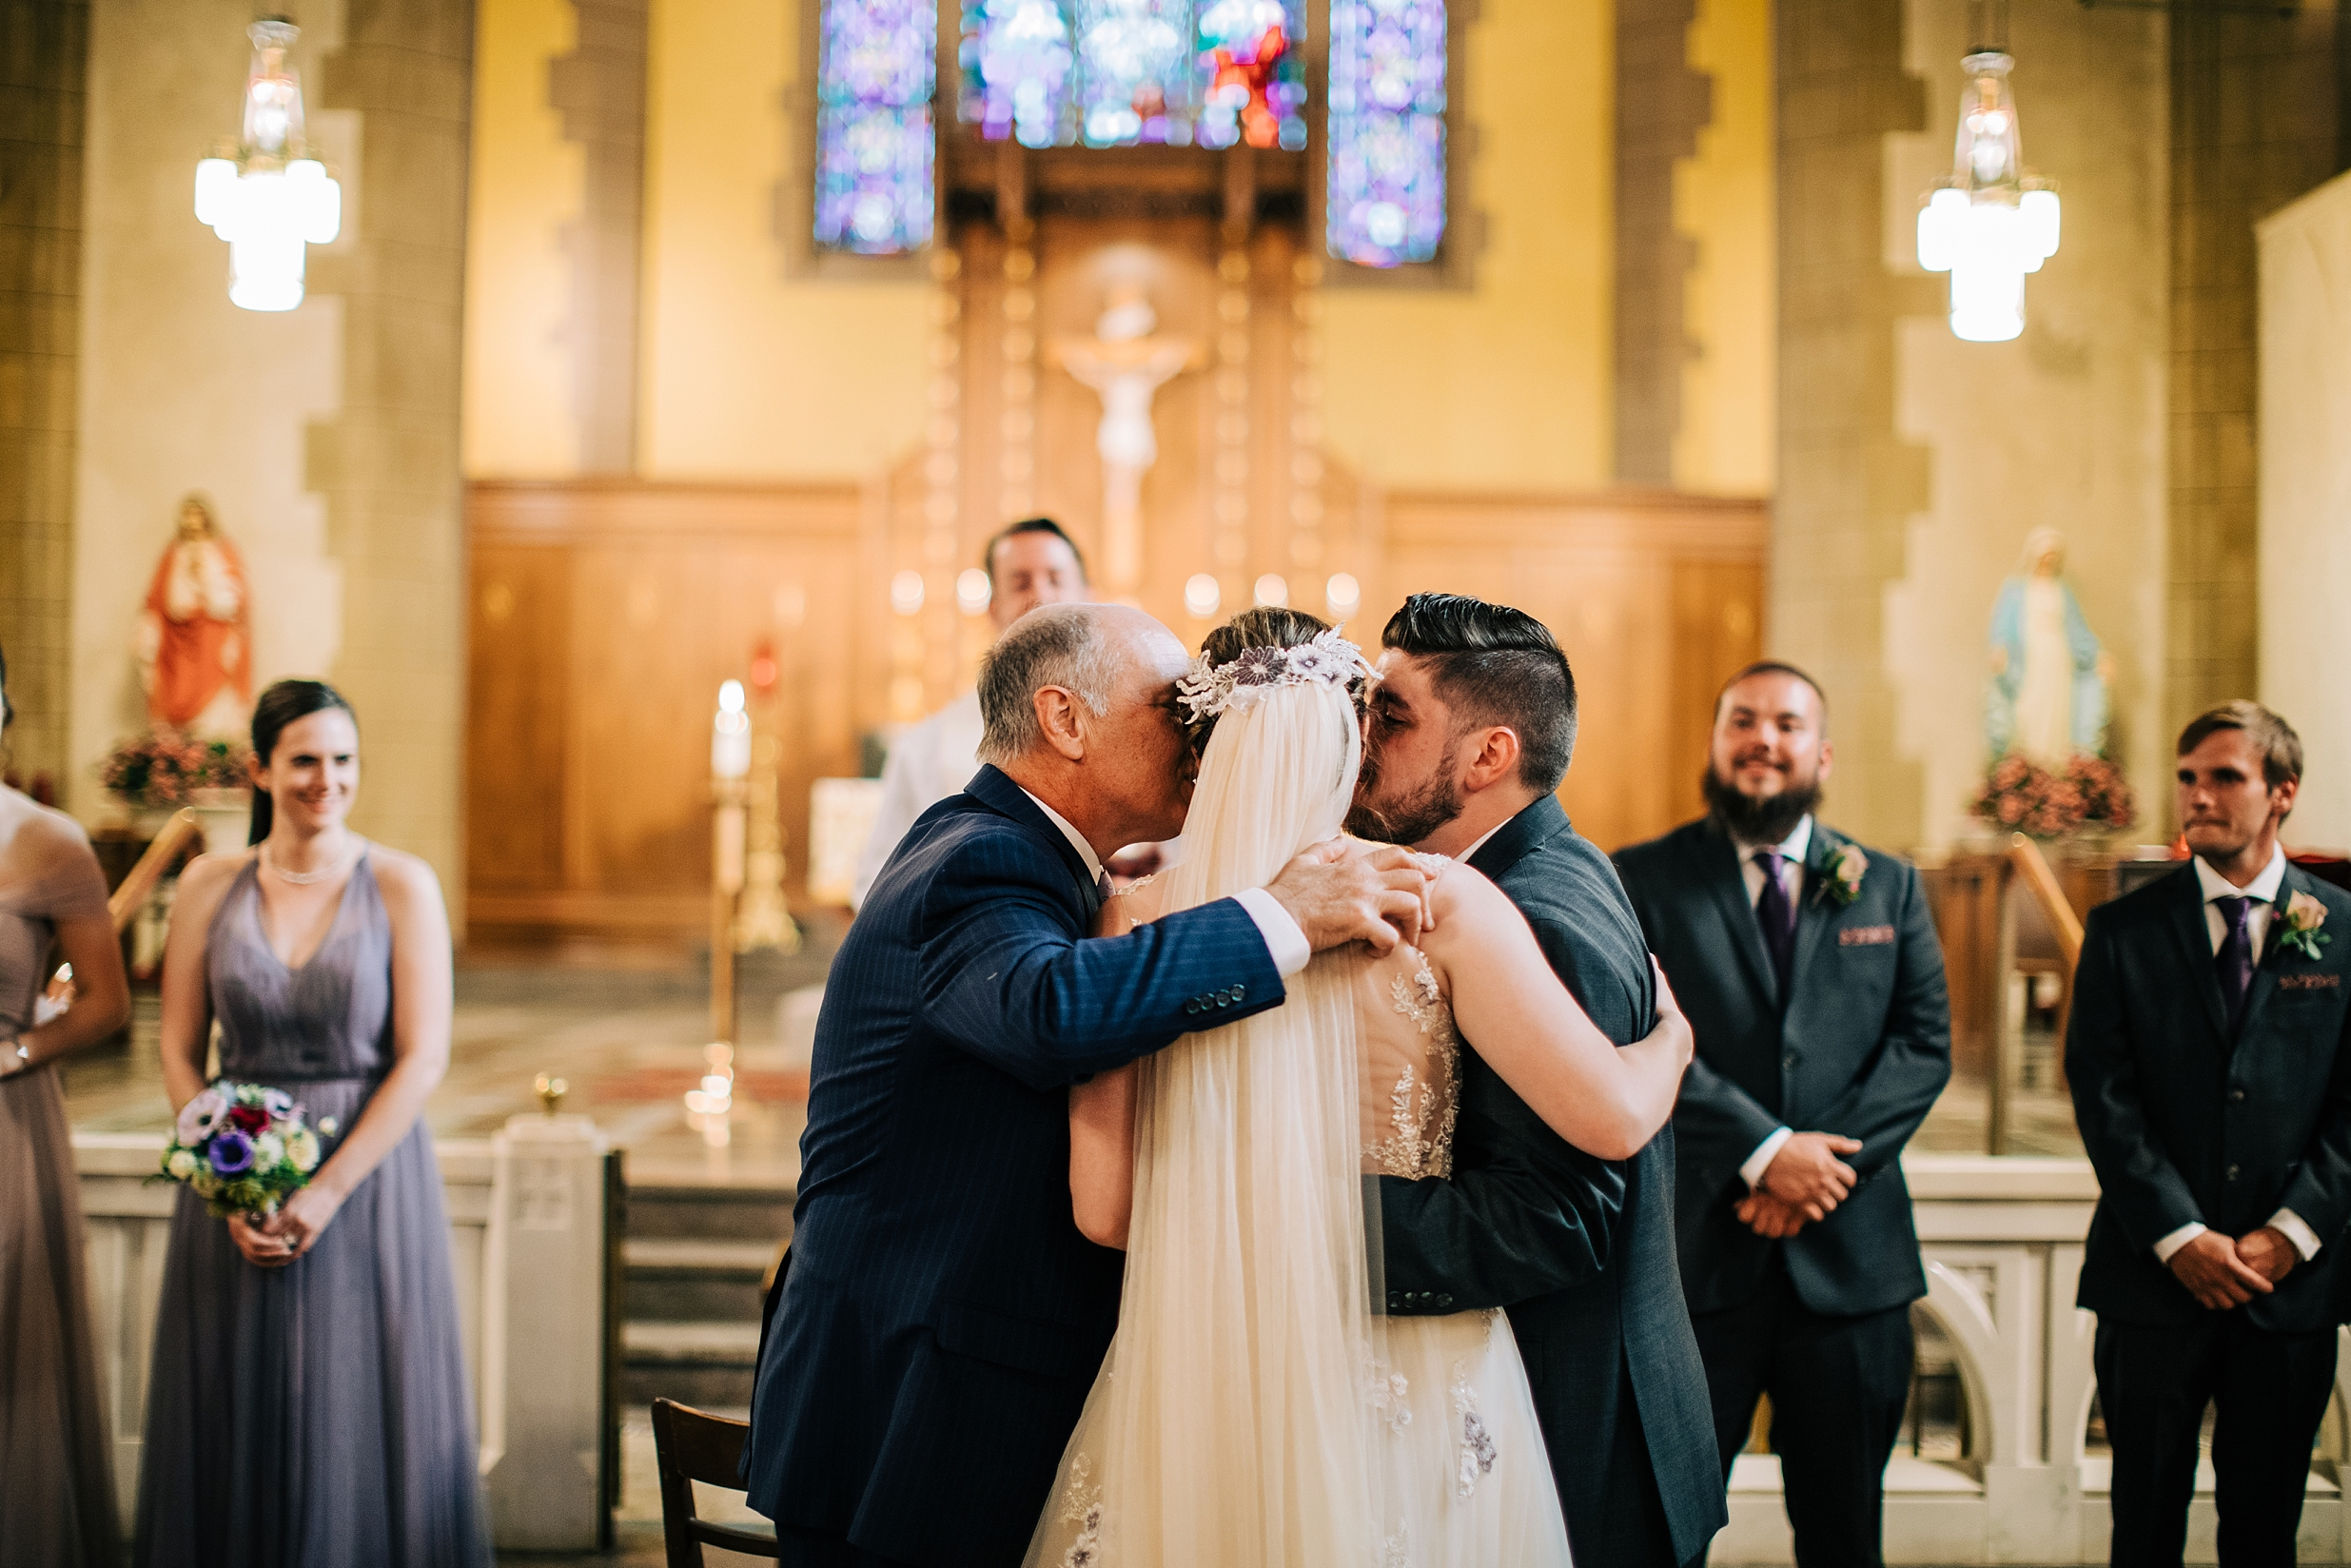 historic-upstate-ny-wedding-church-backyard-photographer_0017.jpg